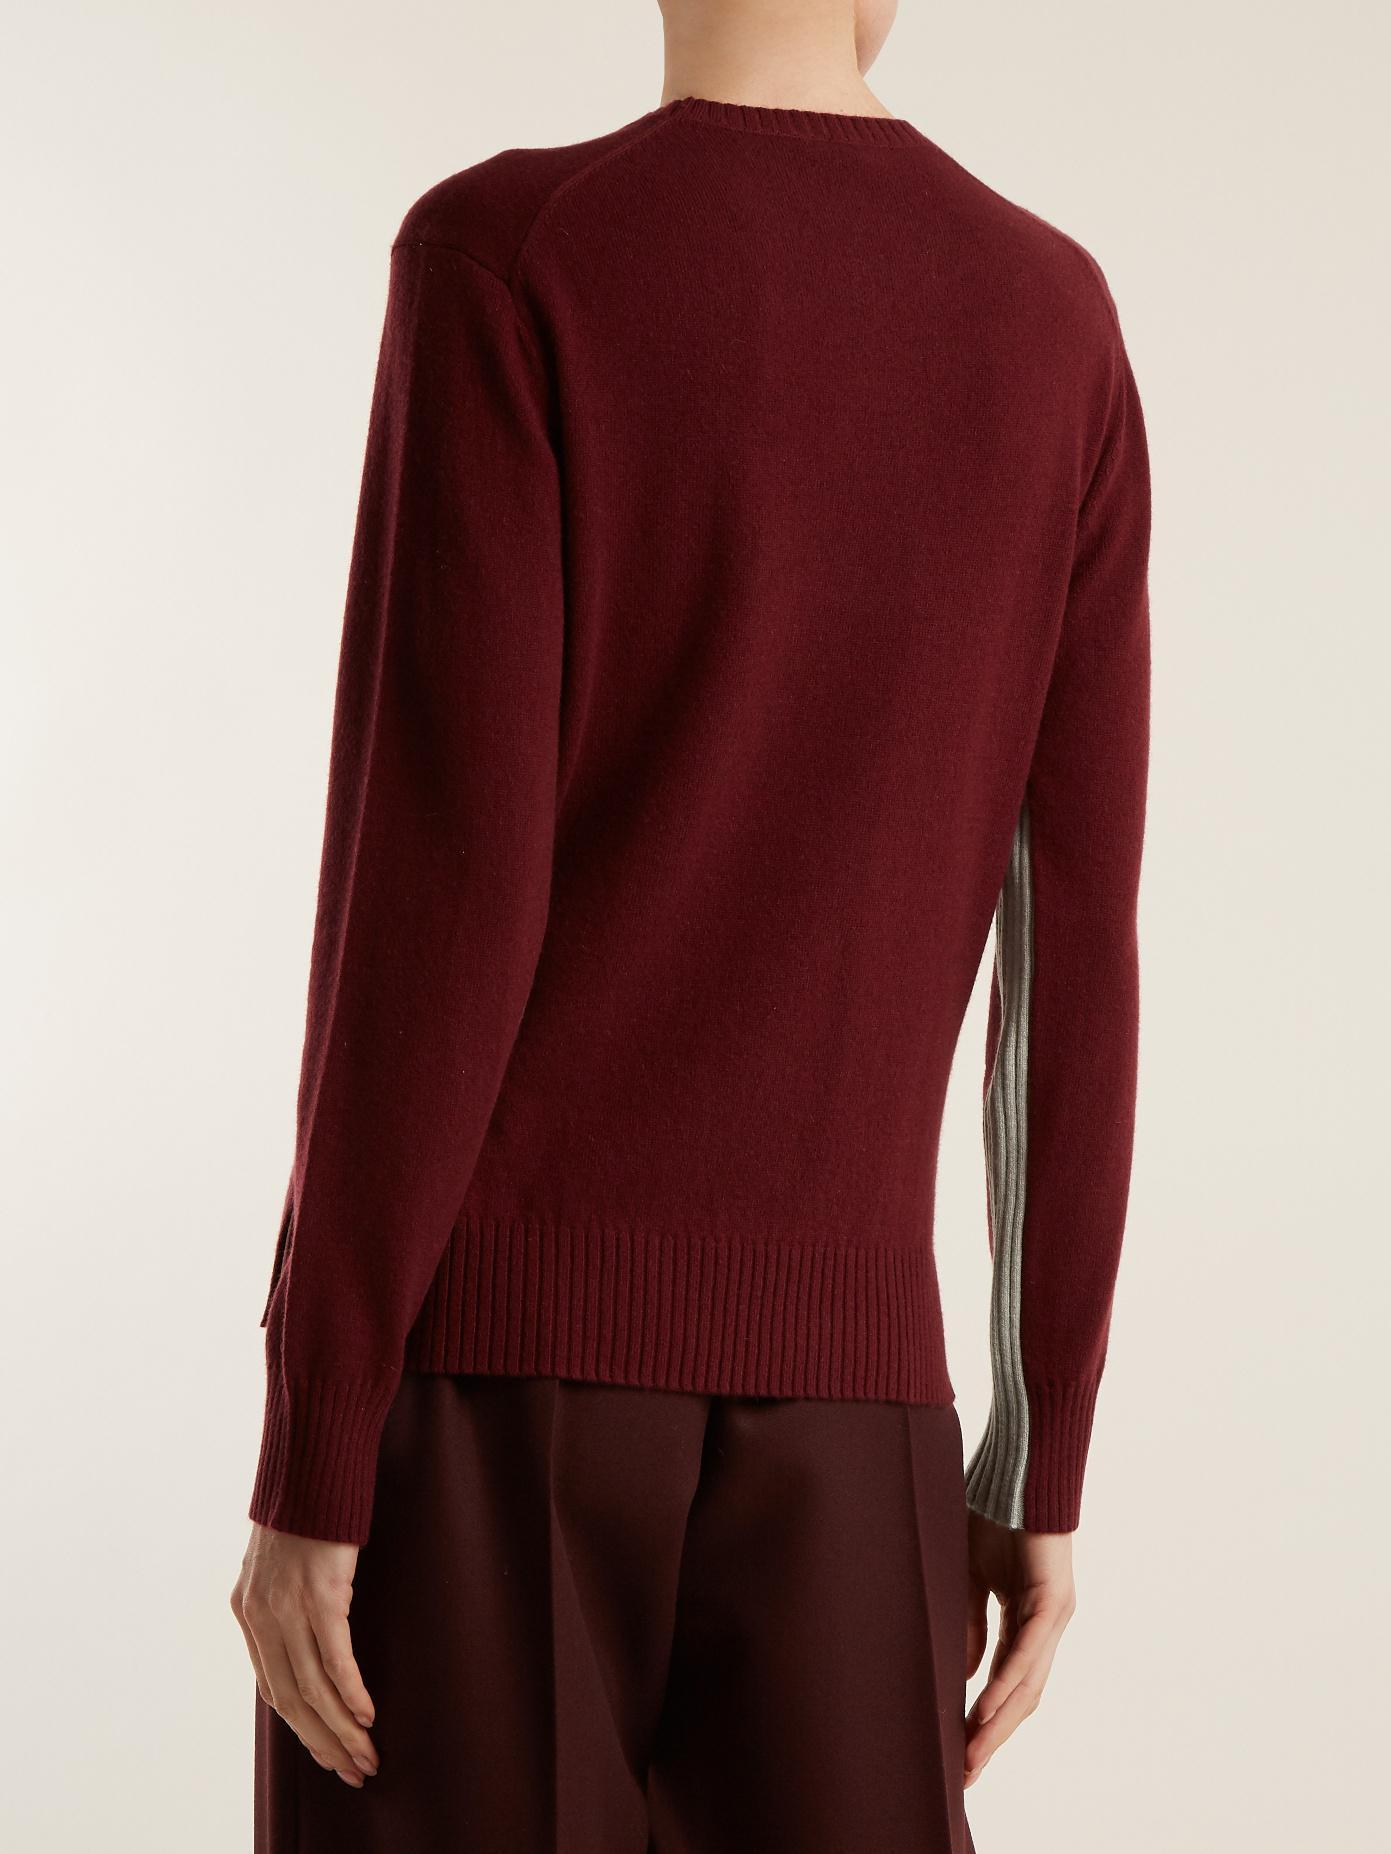 Joseph Morgon Contrast-panel Cashmere Sweater | Lyst